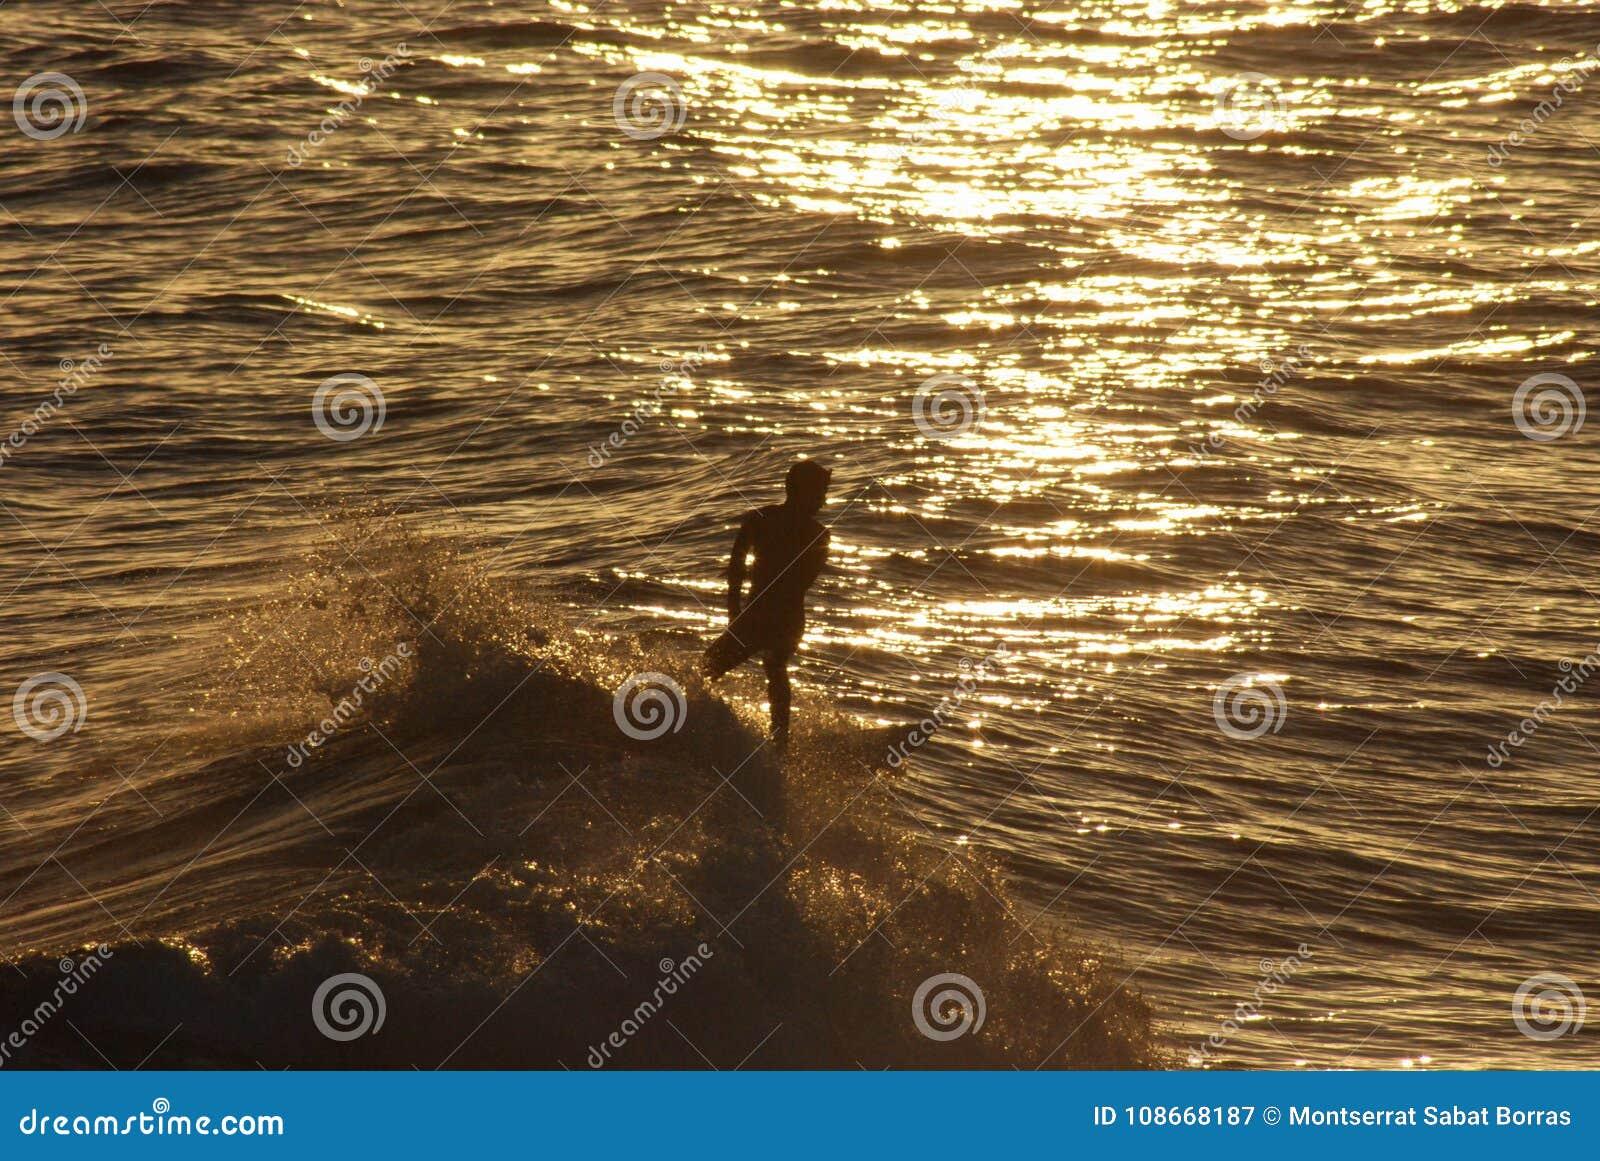 Boy Surfing On A Mediterranean Beach At Sunset Stock Image